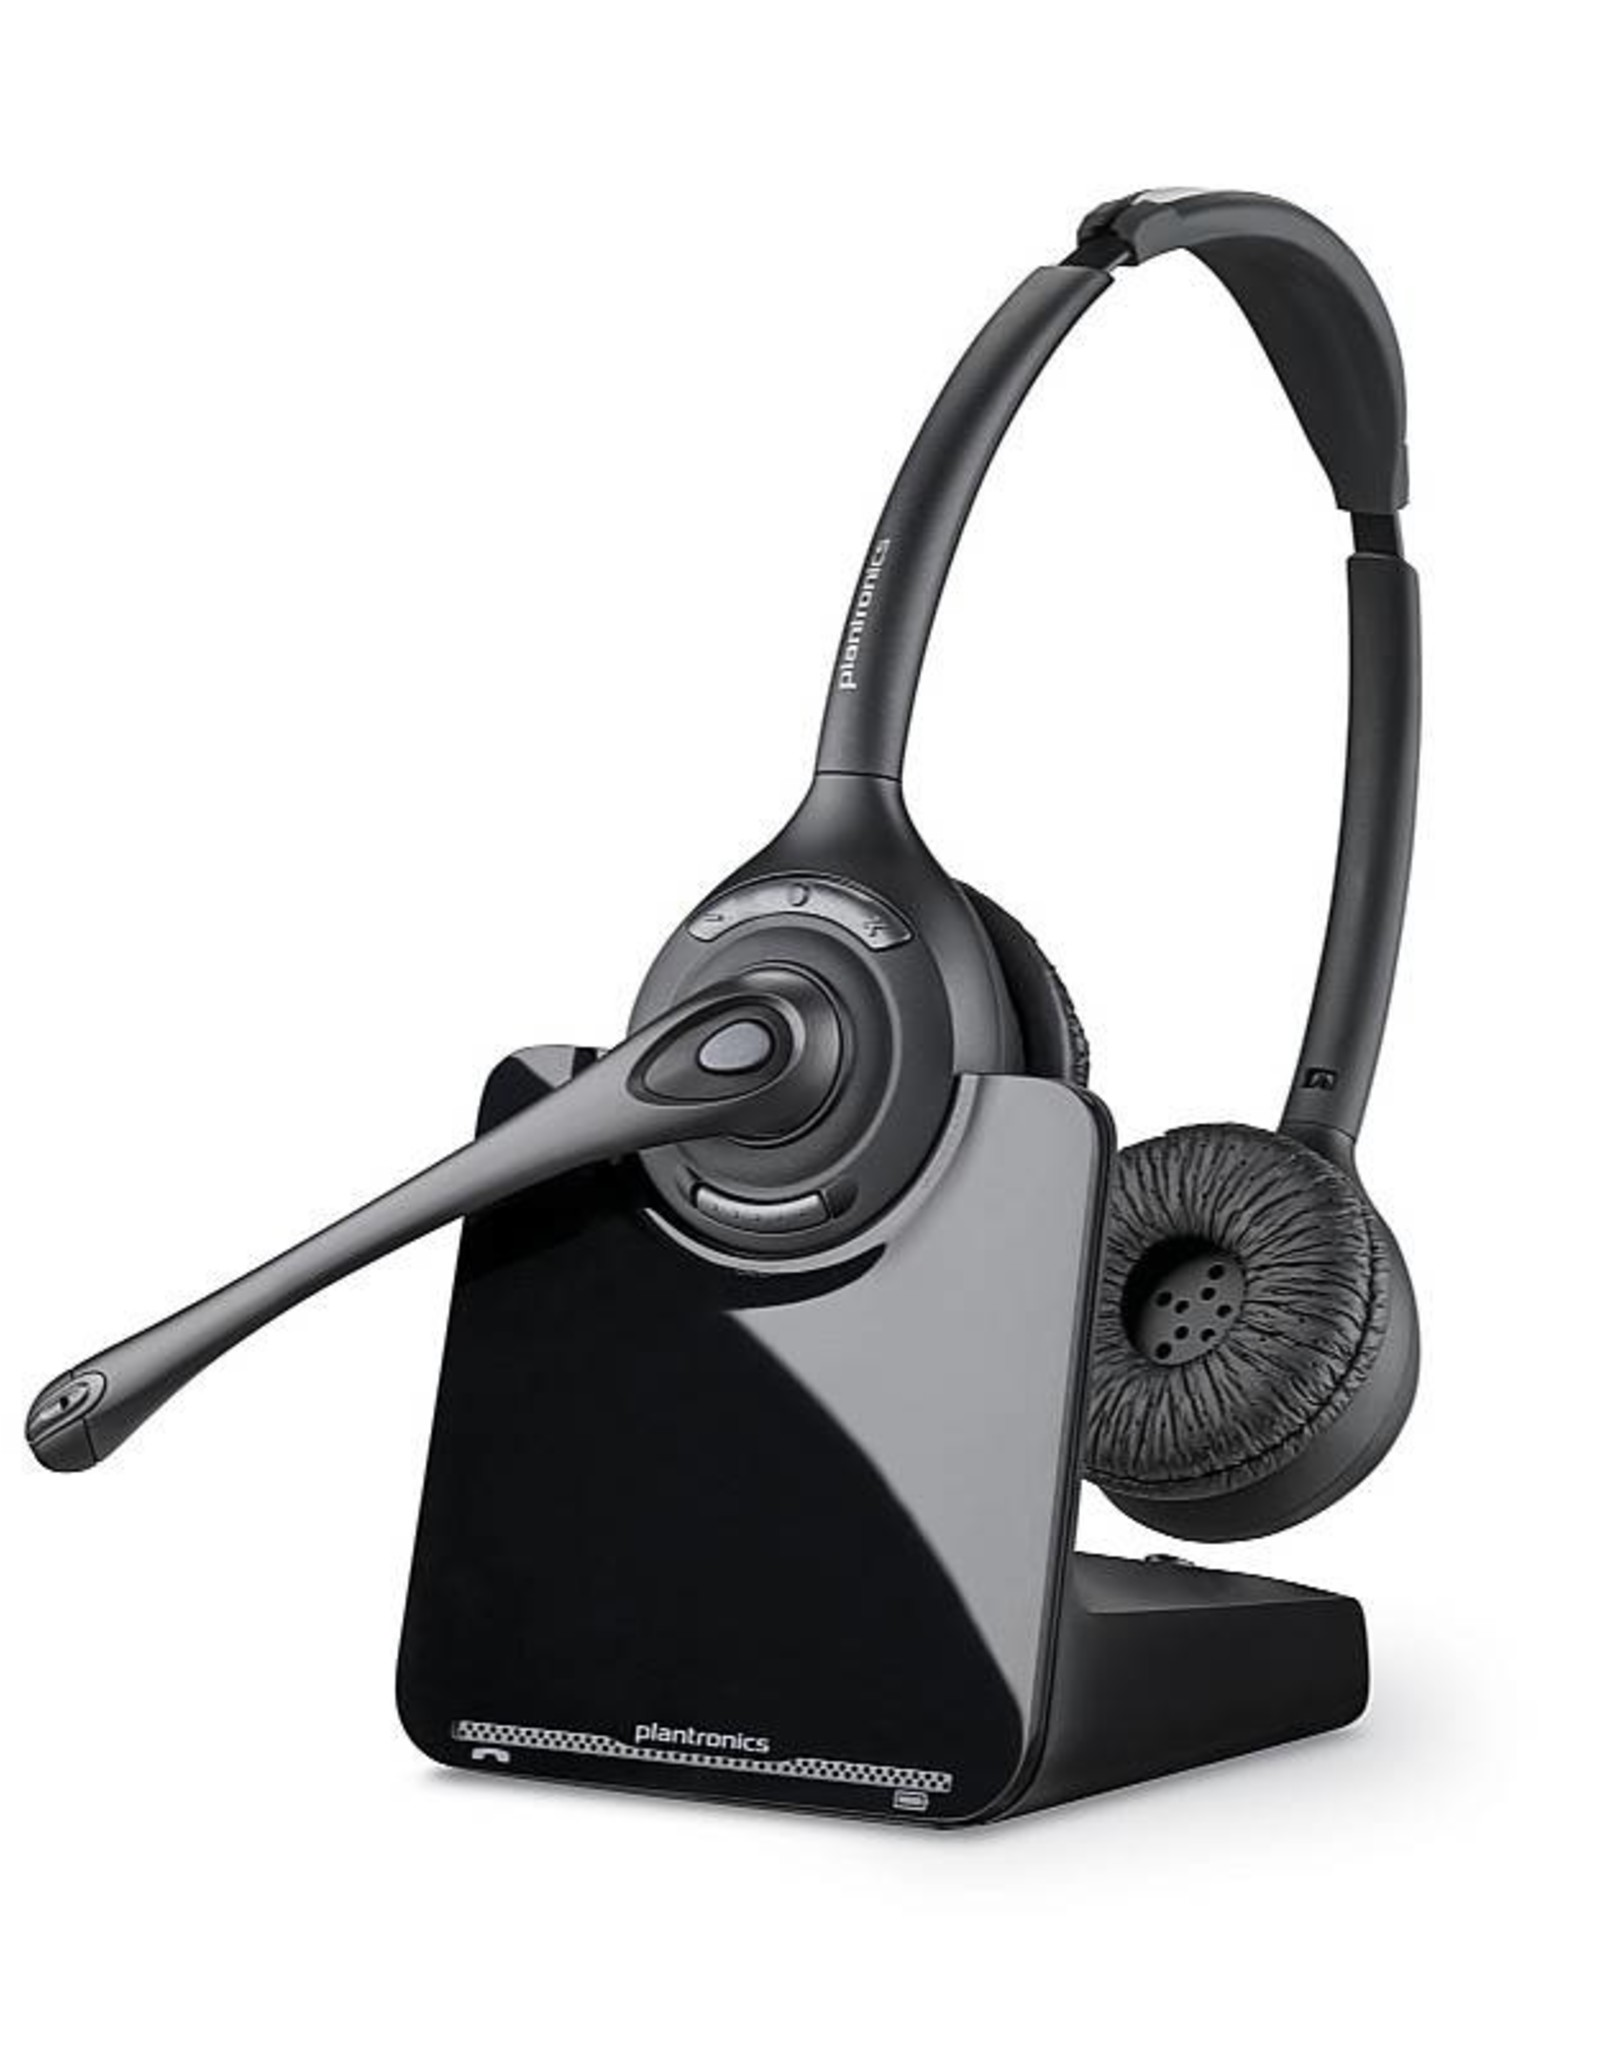 Plantronics Plantronics CS520 Binaural OTH Headset